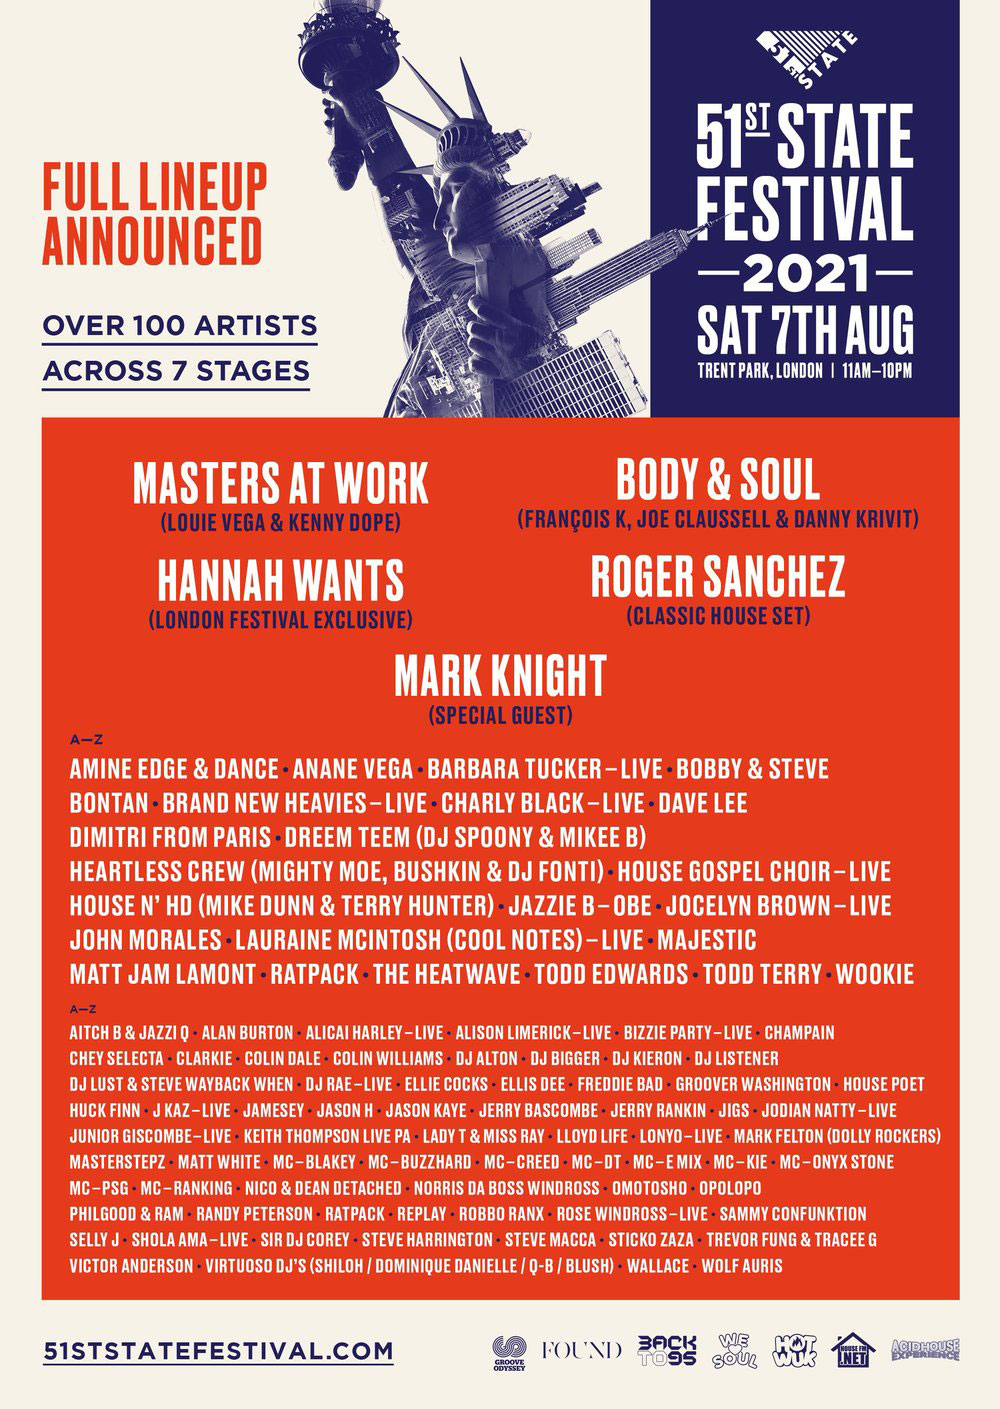 51st State Festival 2021 poster